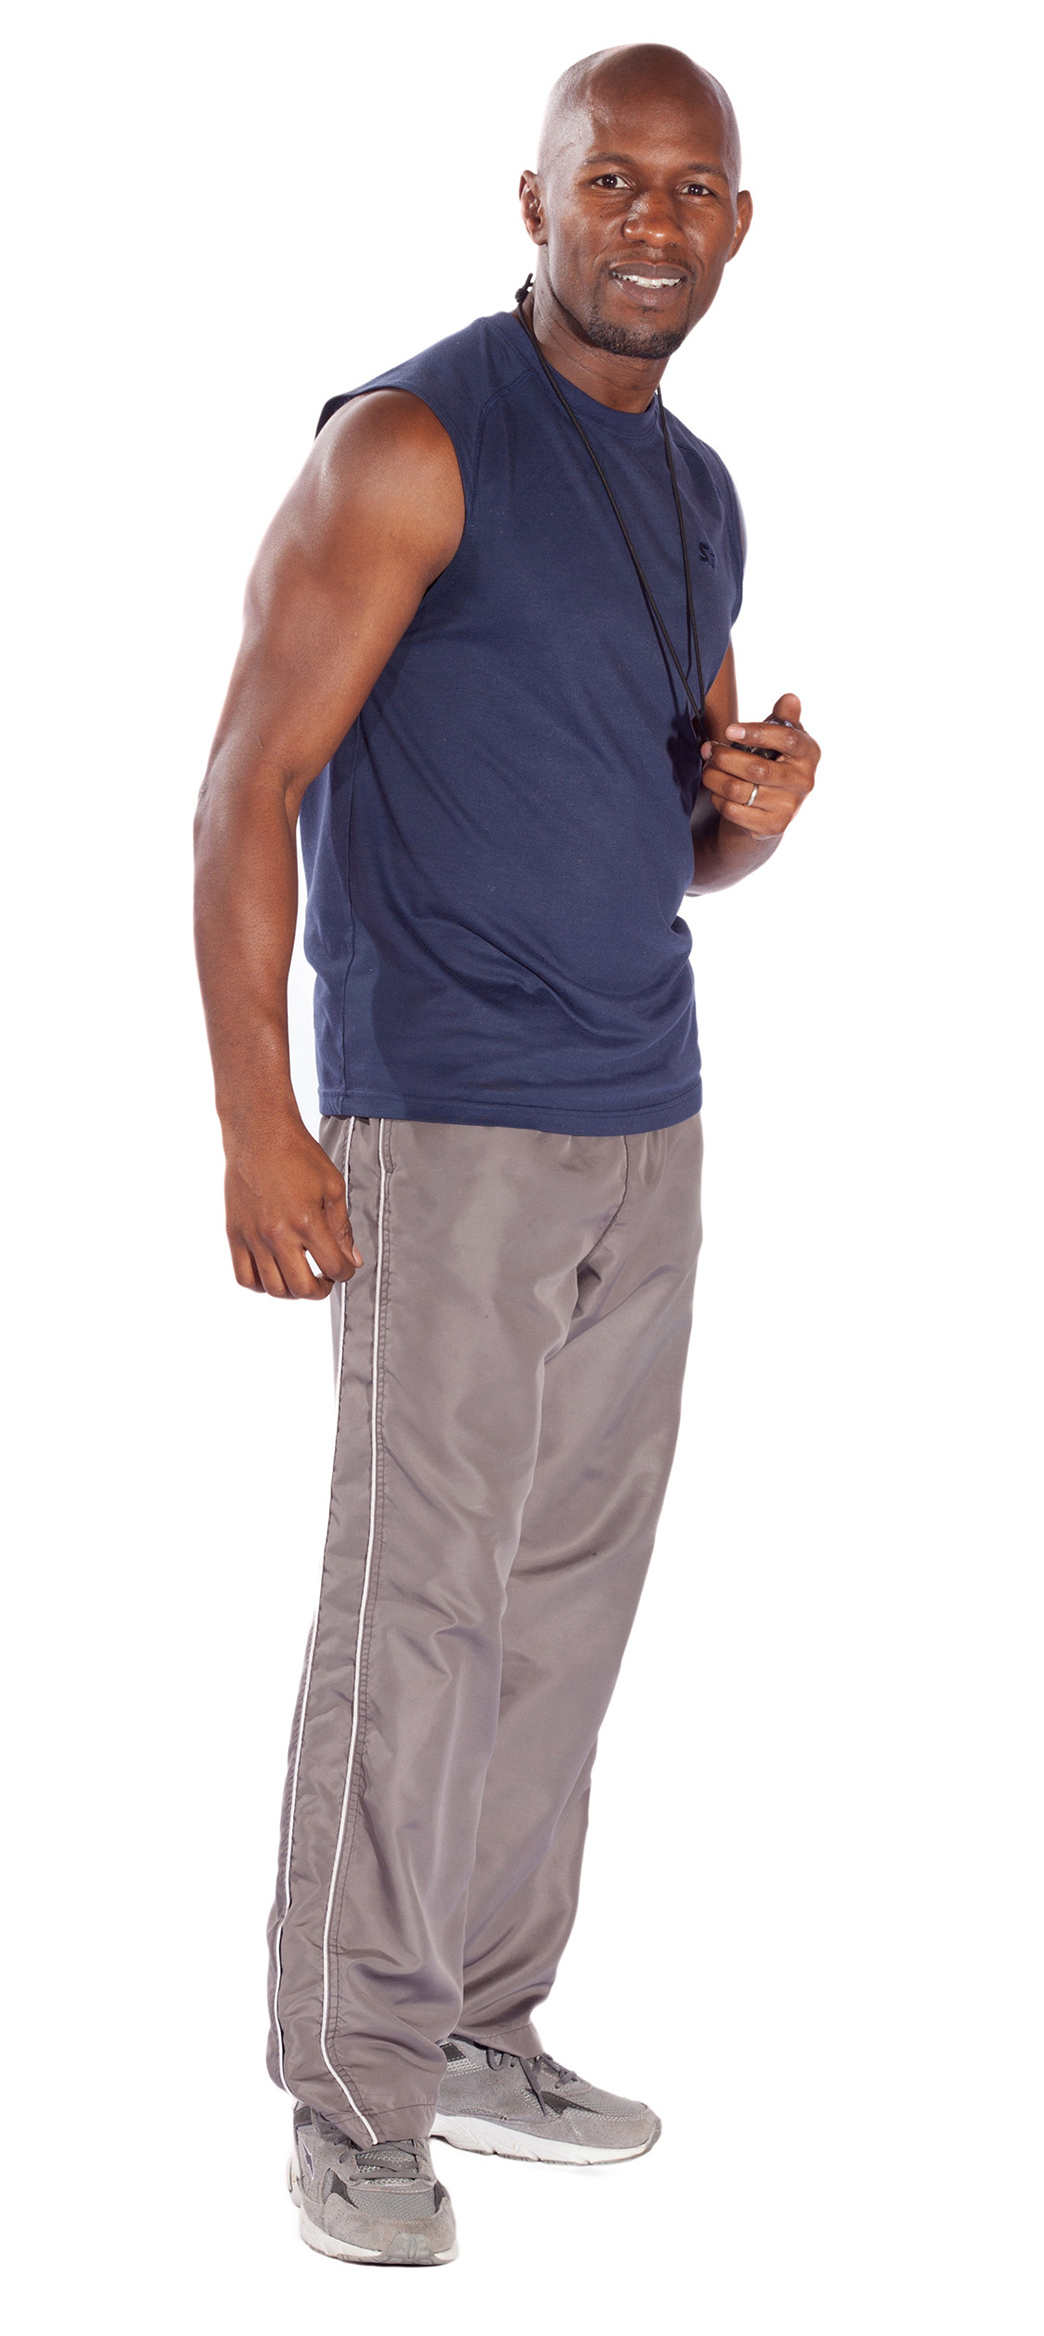 michael-flannagan-40-below-fitness-center-fairbanks-ak-035-web-2.jpg